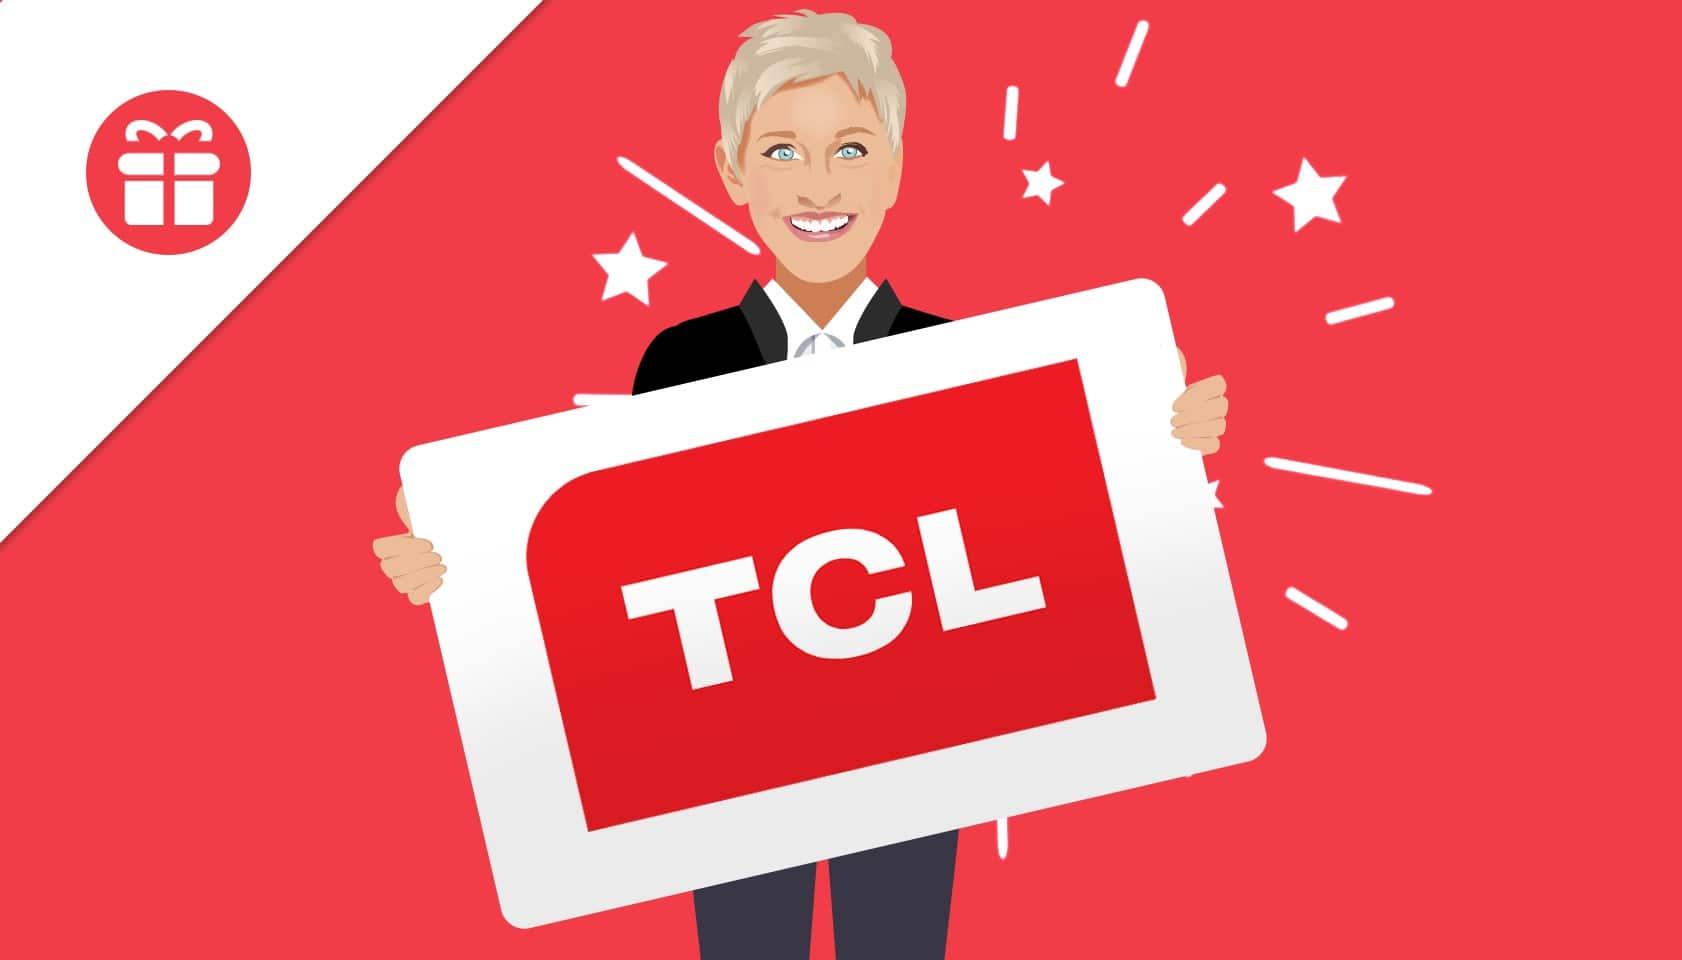 win tcl tv ellen